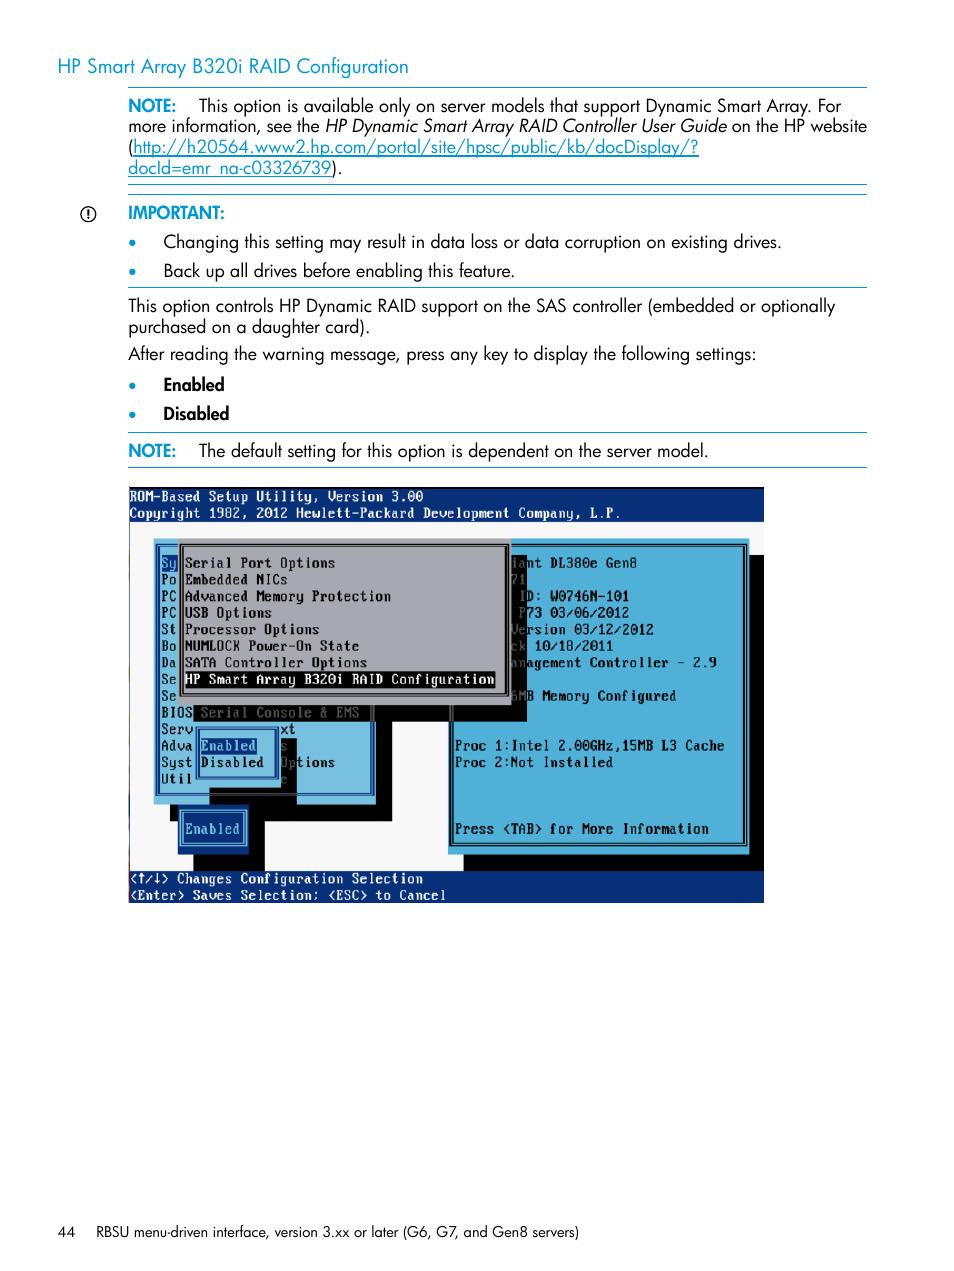 Hp smart array b320i raid configuration   HP ROM-Based Setup Utility